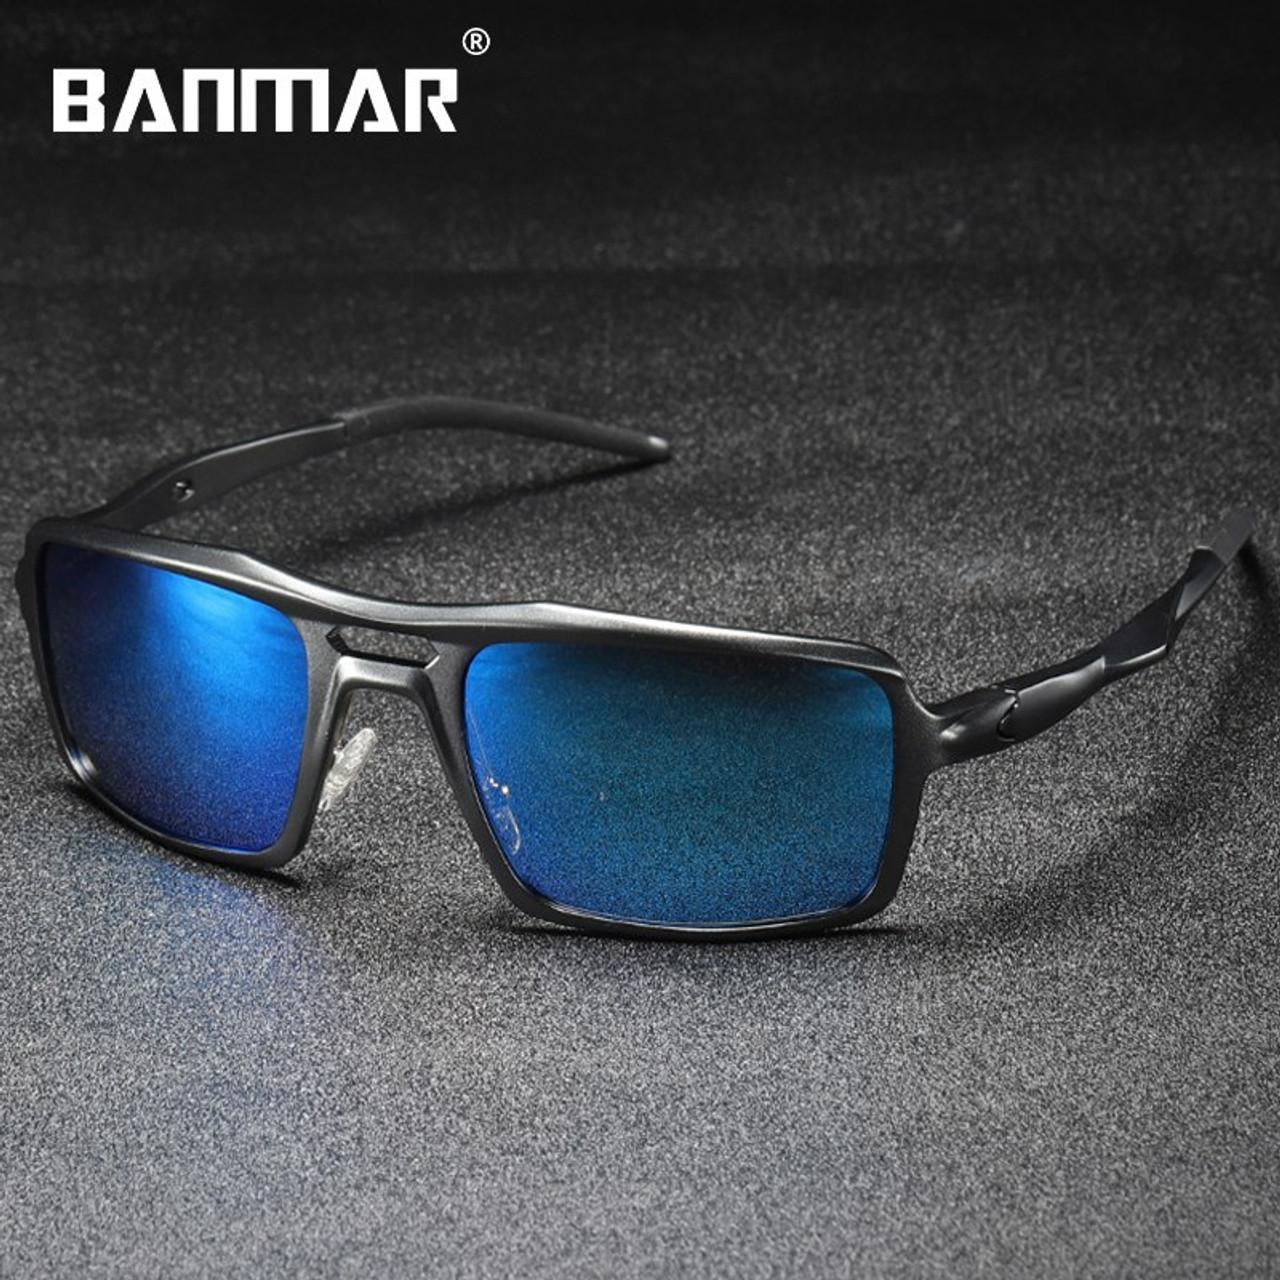 290d55a8f2 BANMAR Sunglasses Men Aluminum Magnesium Sun Glasses AL-MG Polarized  Driving Male Eyewear Anti Glare ...